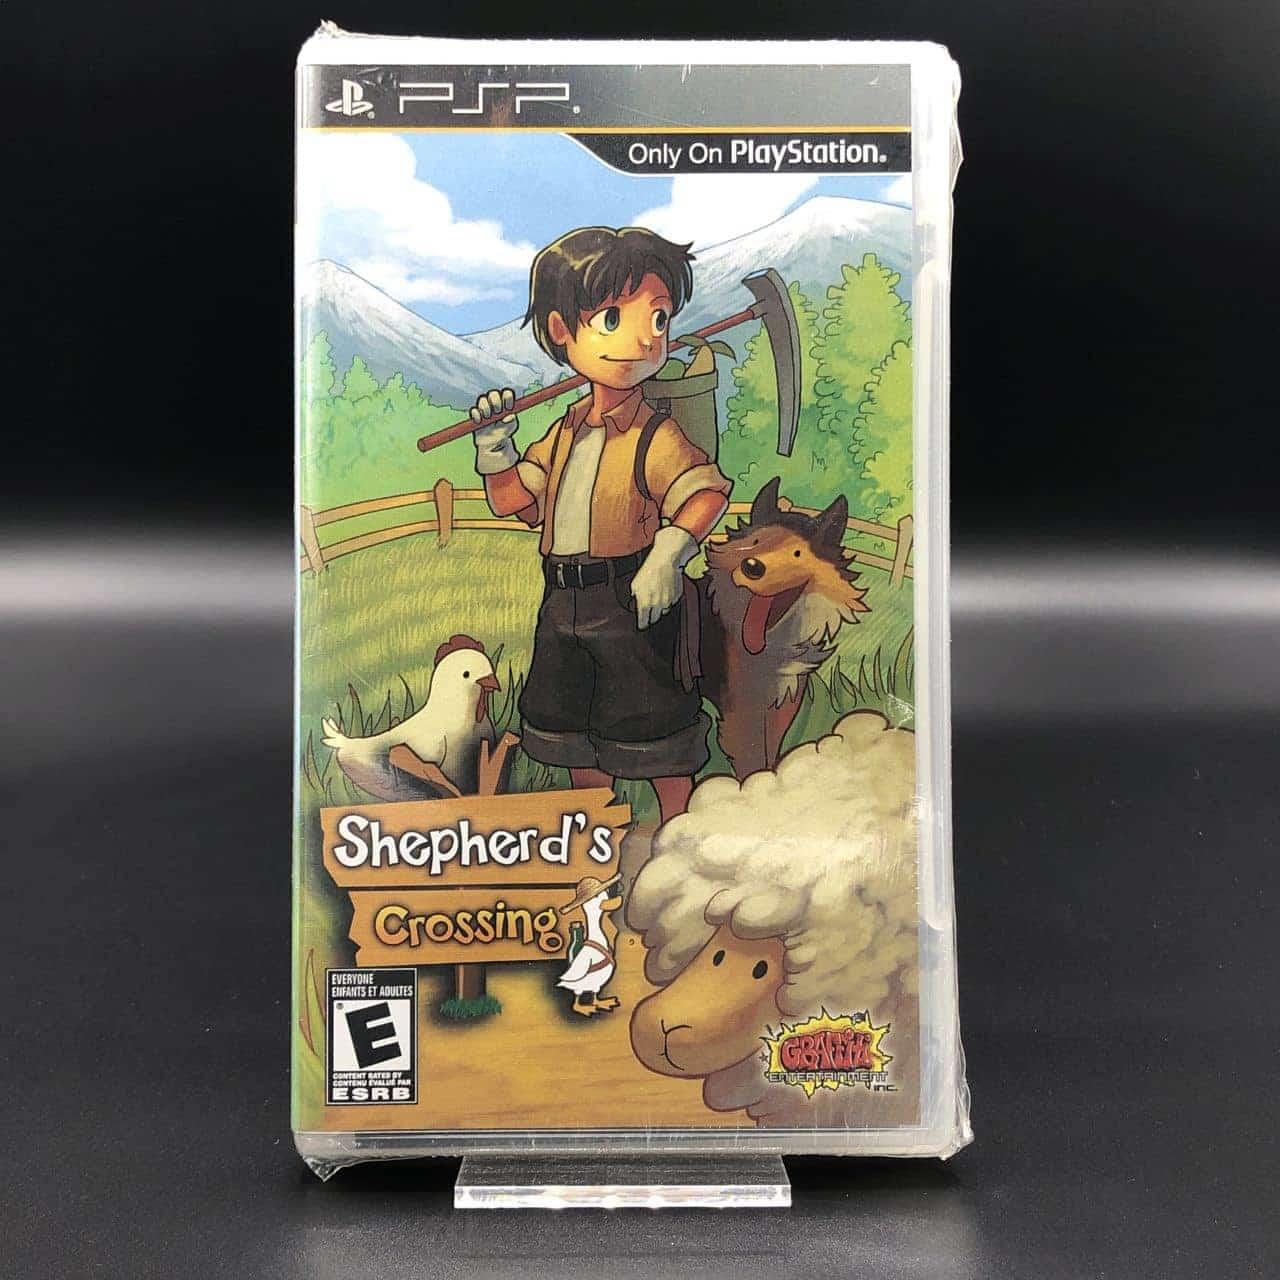 PSP Shepherd's Crossing (NEU) Sony PlayStation Portable